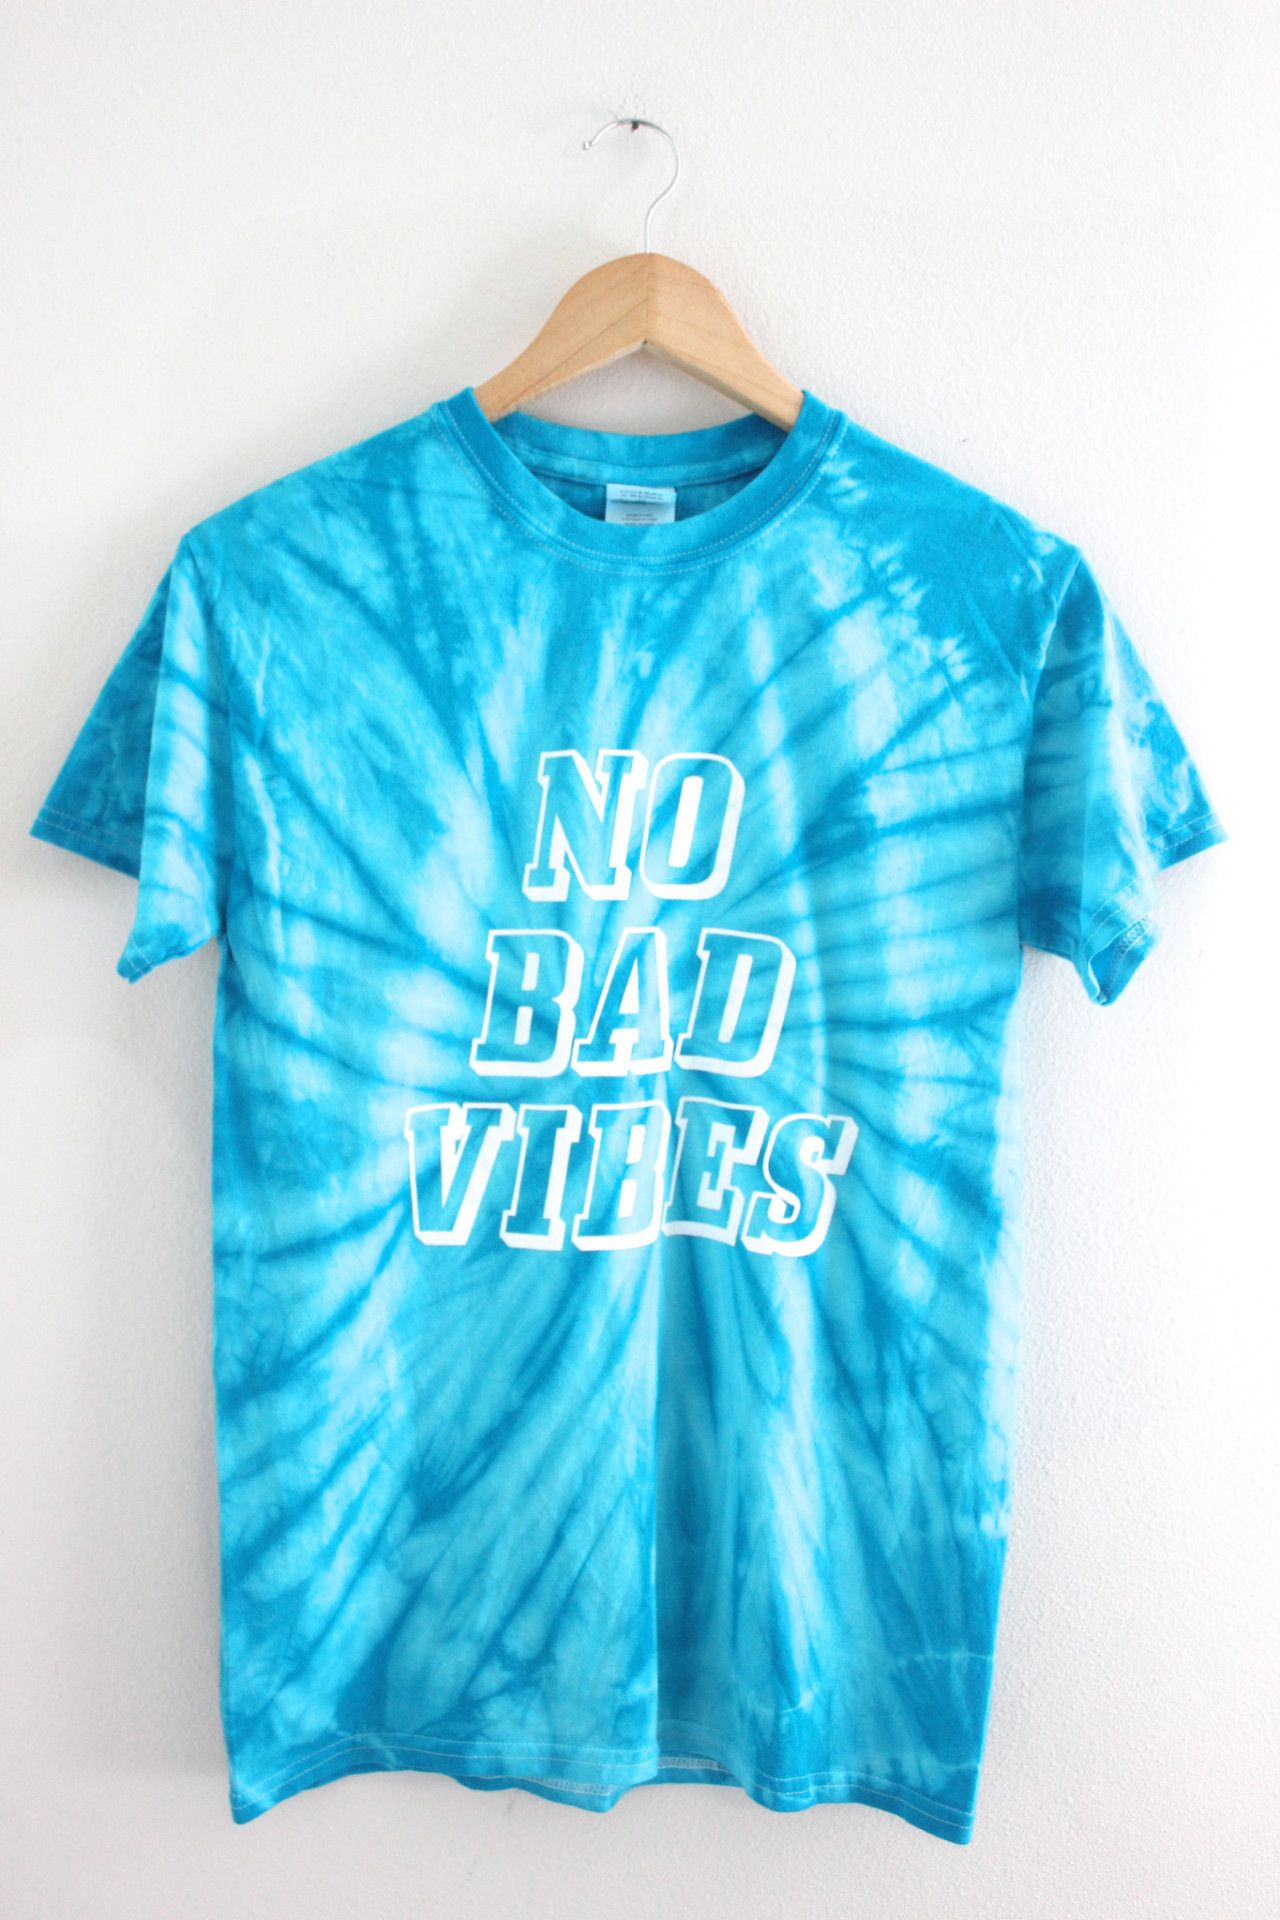 No Bad Vibes Turquoise Tie-Dye Graphic Unisex Tee Trajes Marimachas 4dd1c579443